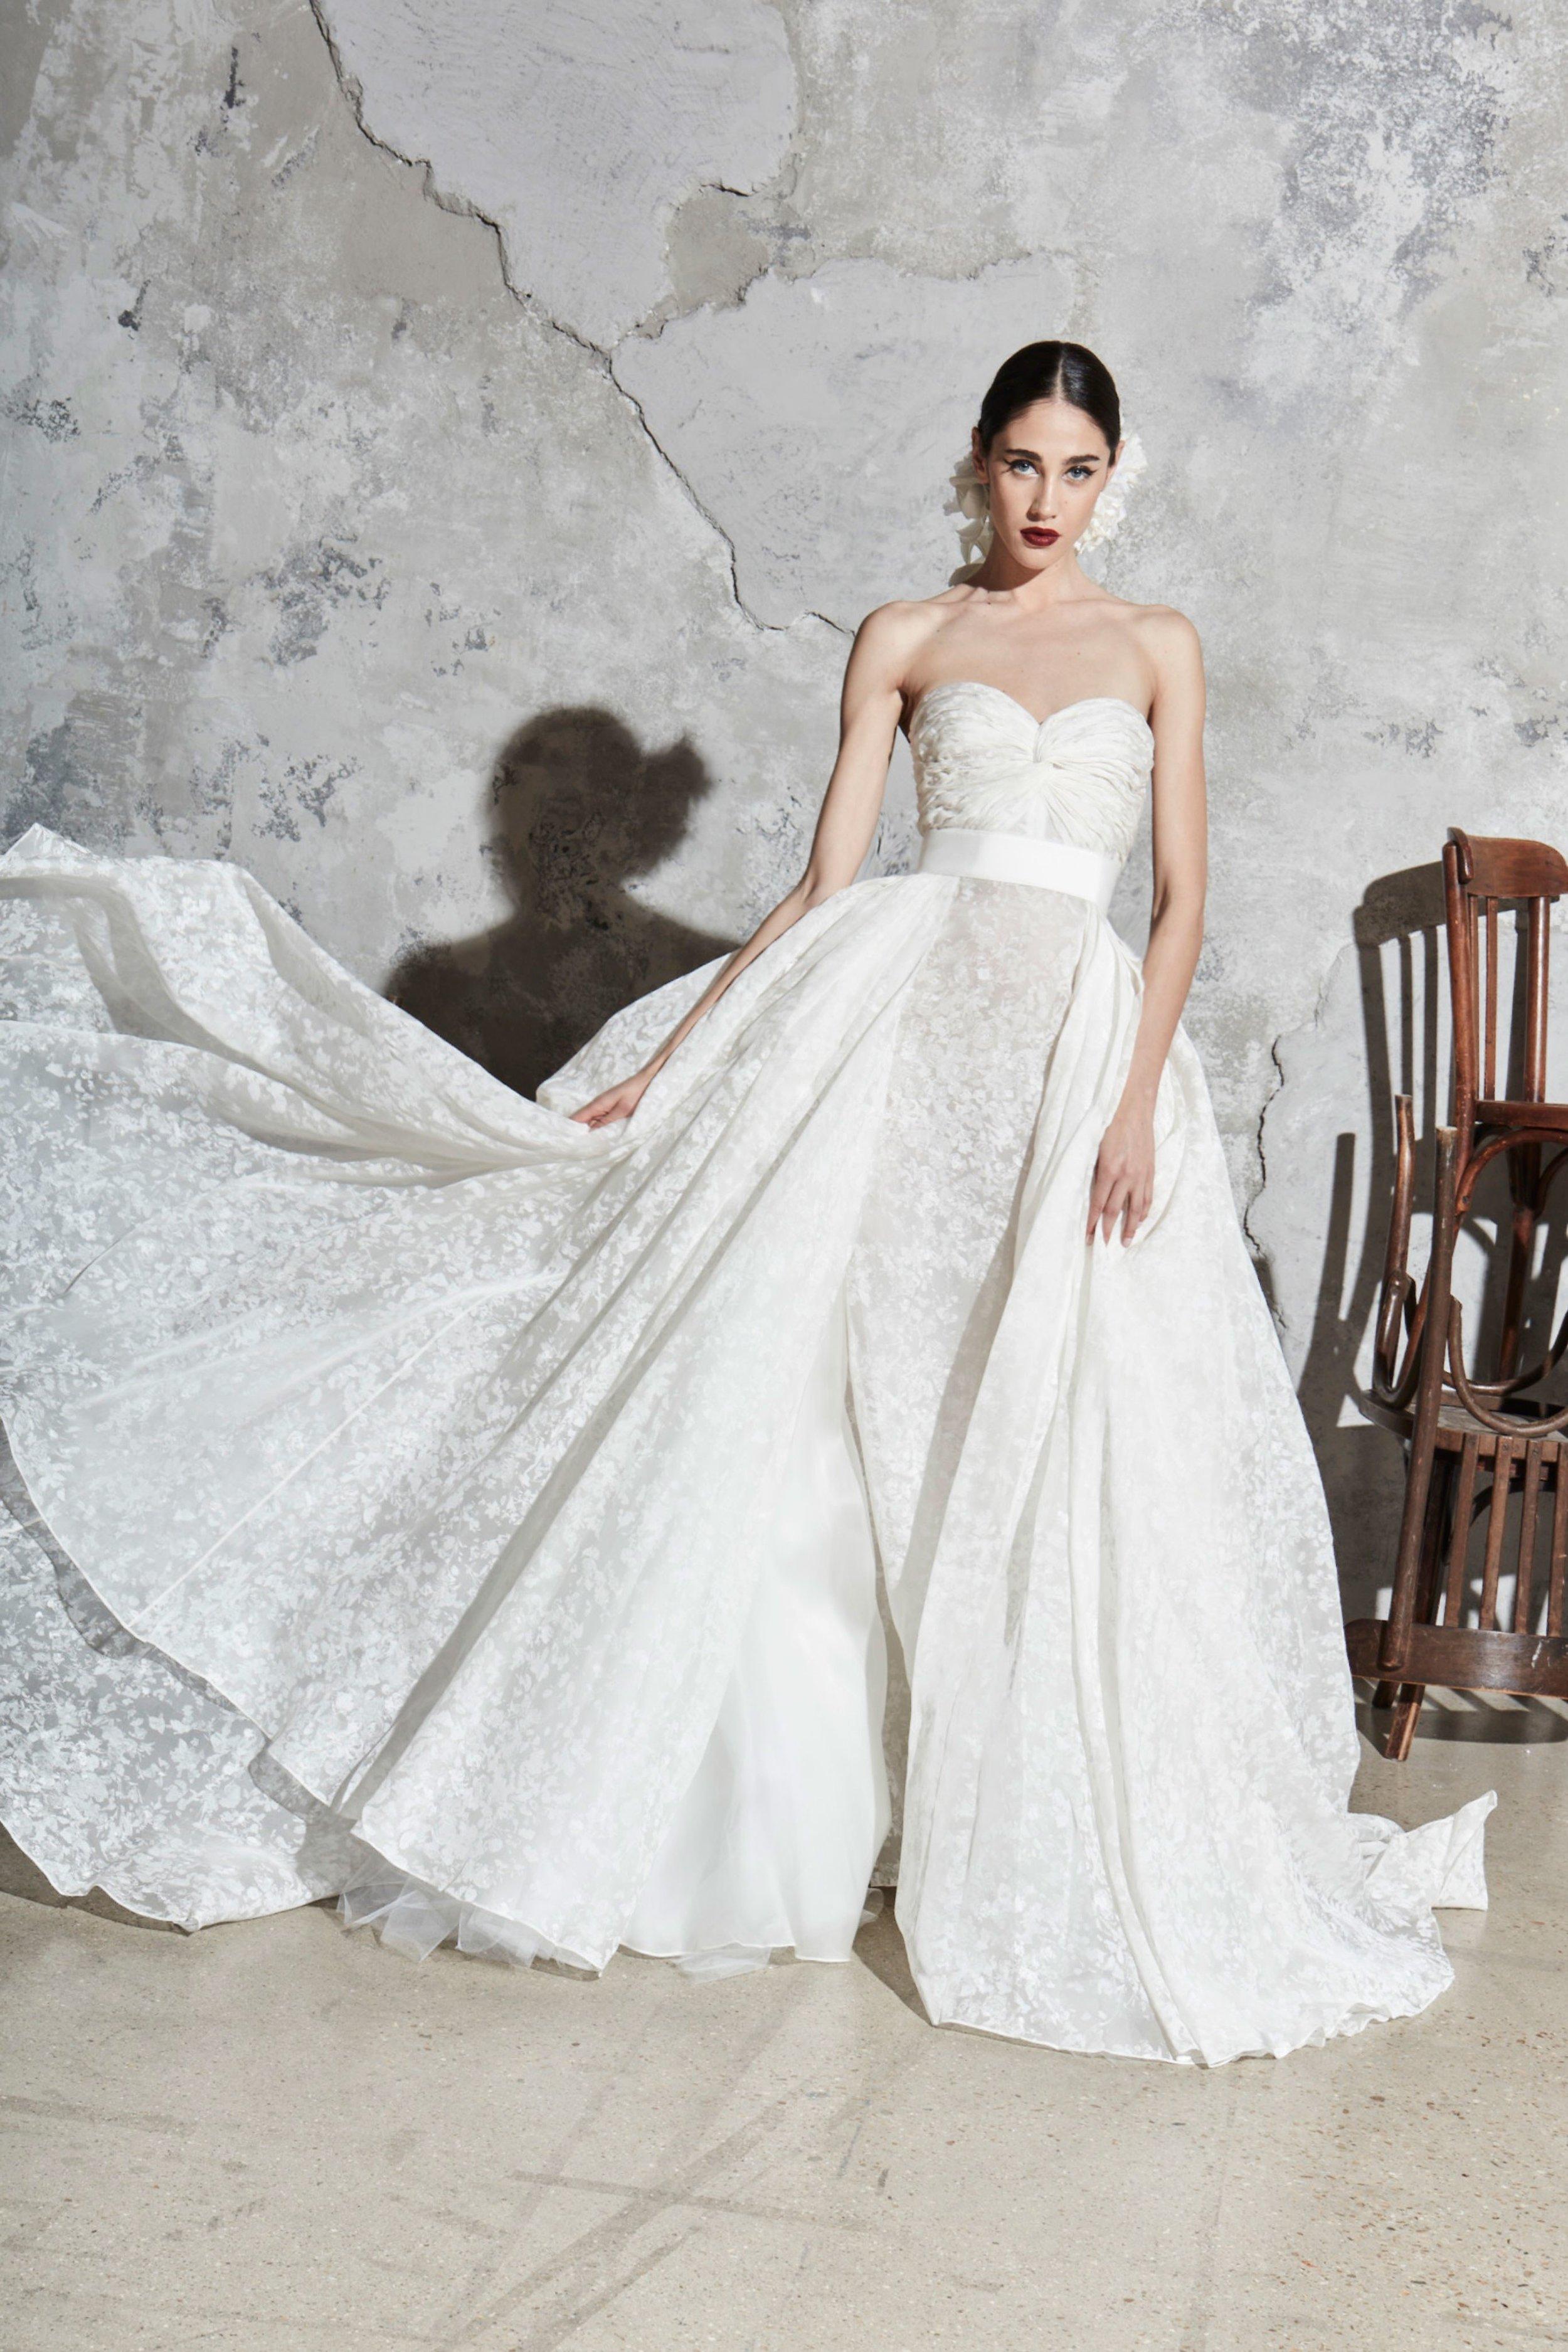 00019-zuhair-murad-new-york-bridal-Spring-2020-CREDIT-Thomas-Nutzl.jpg